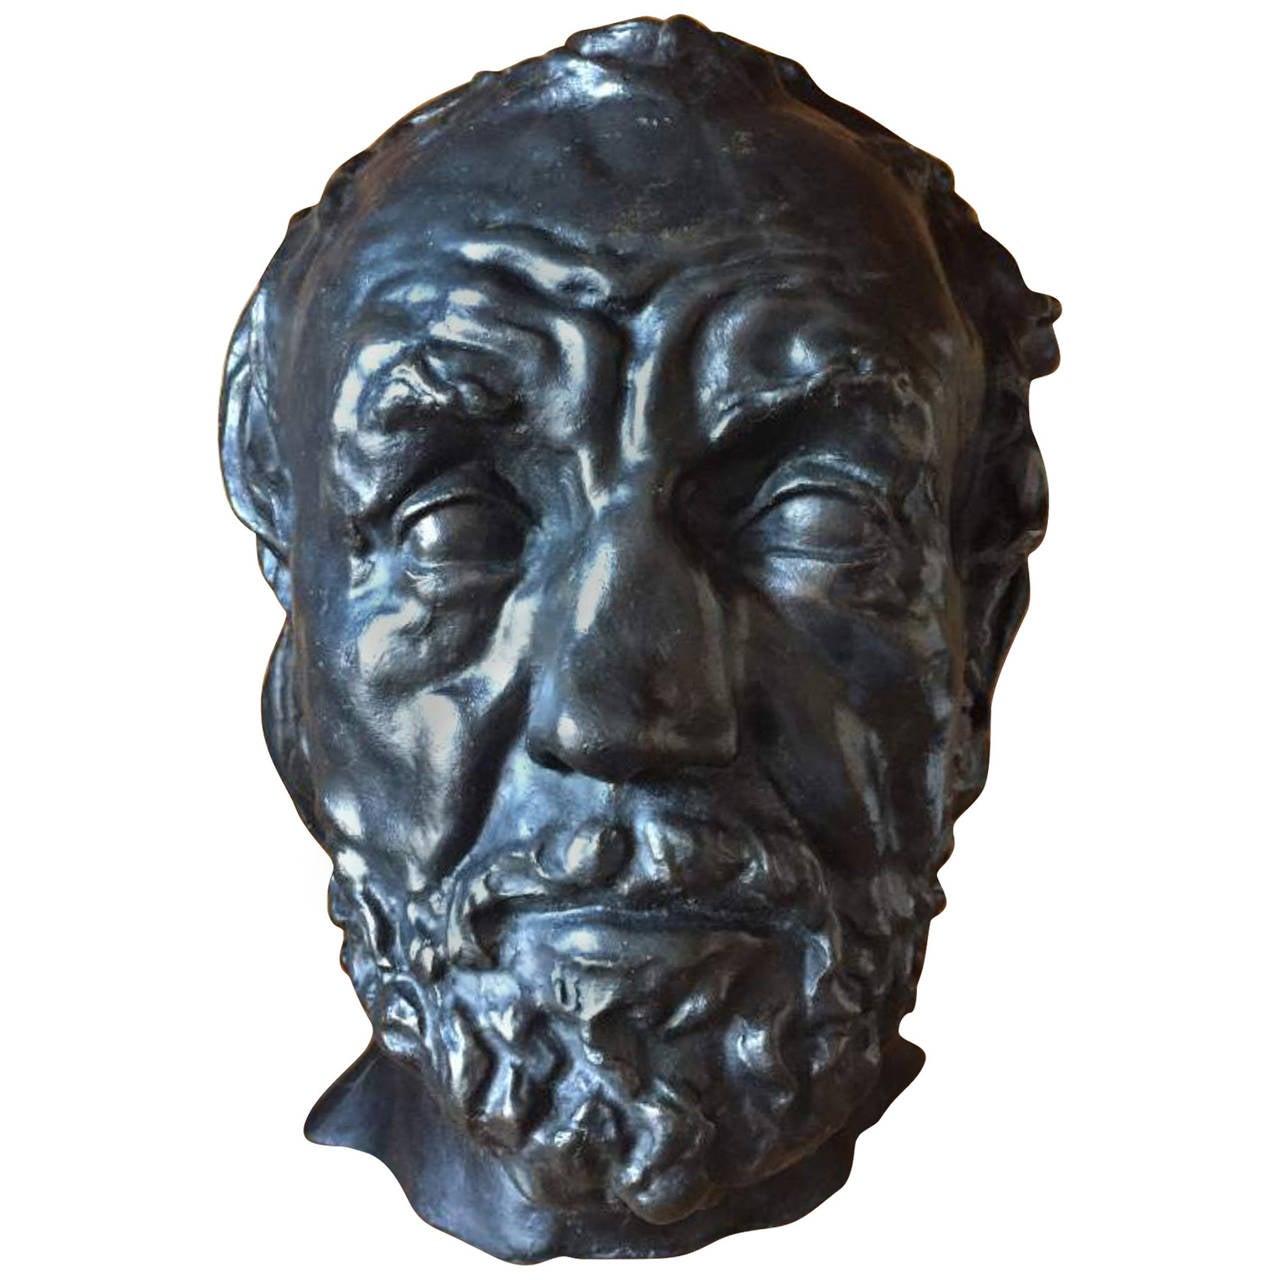 auguste rodin bronze sculpture  u0026quot man with a broken nose u0026quot  at 1stdibs